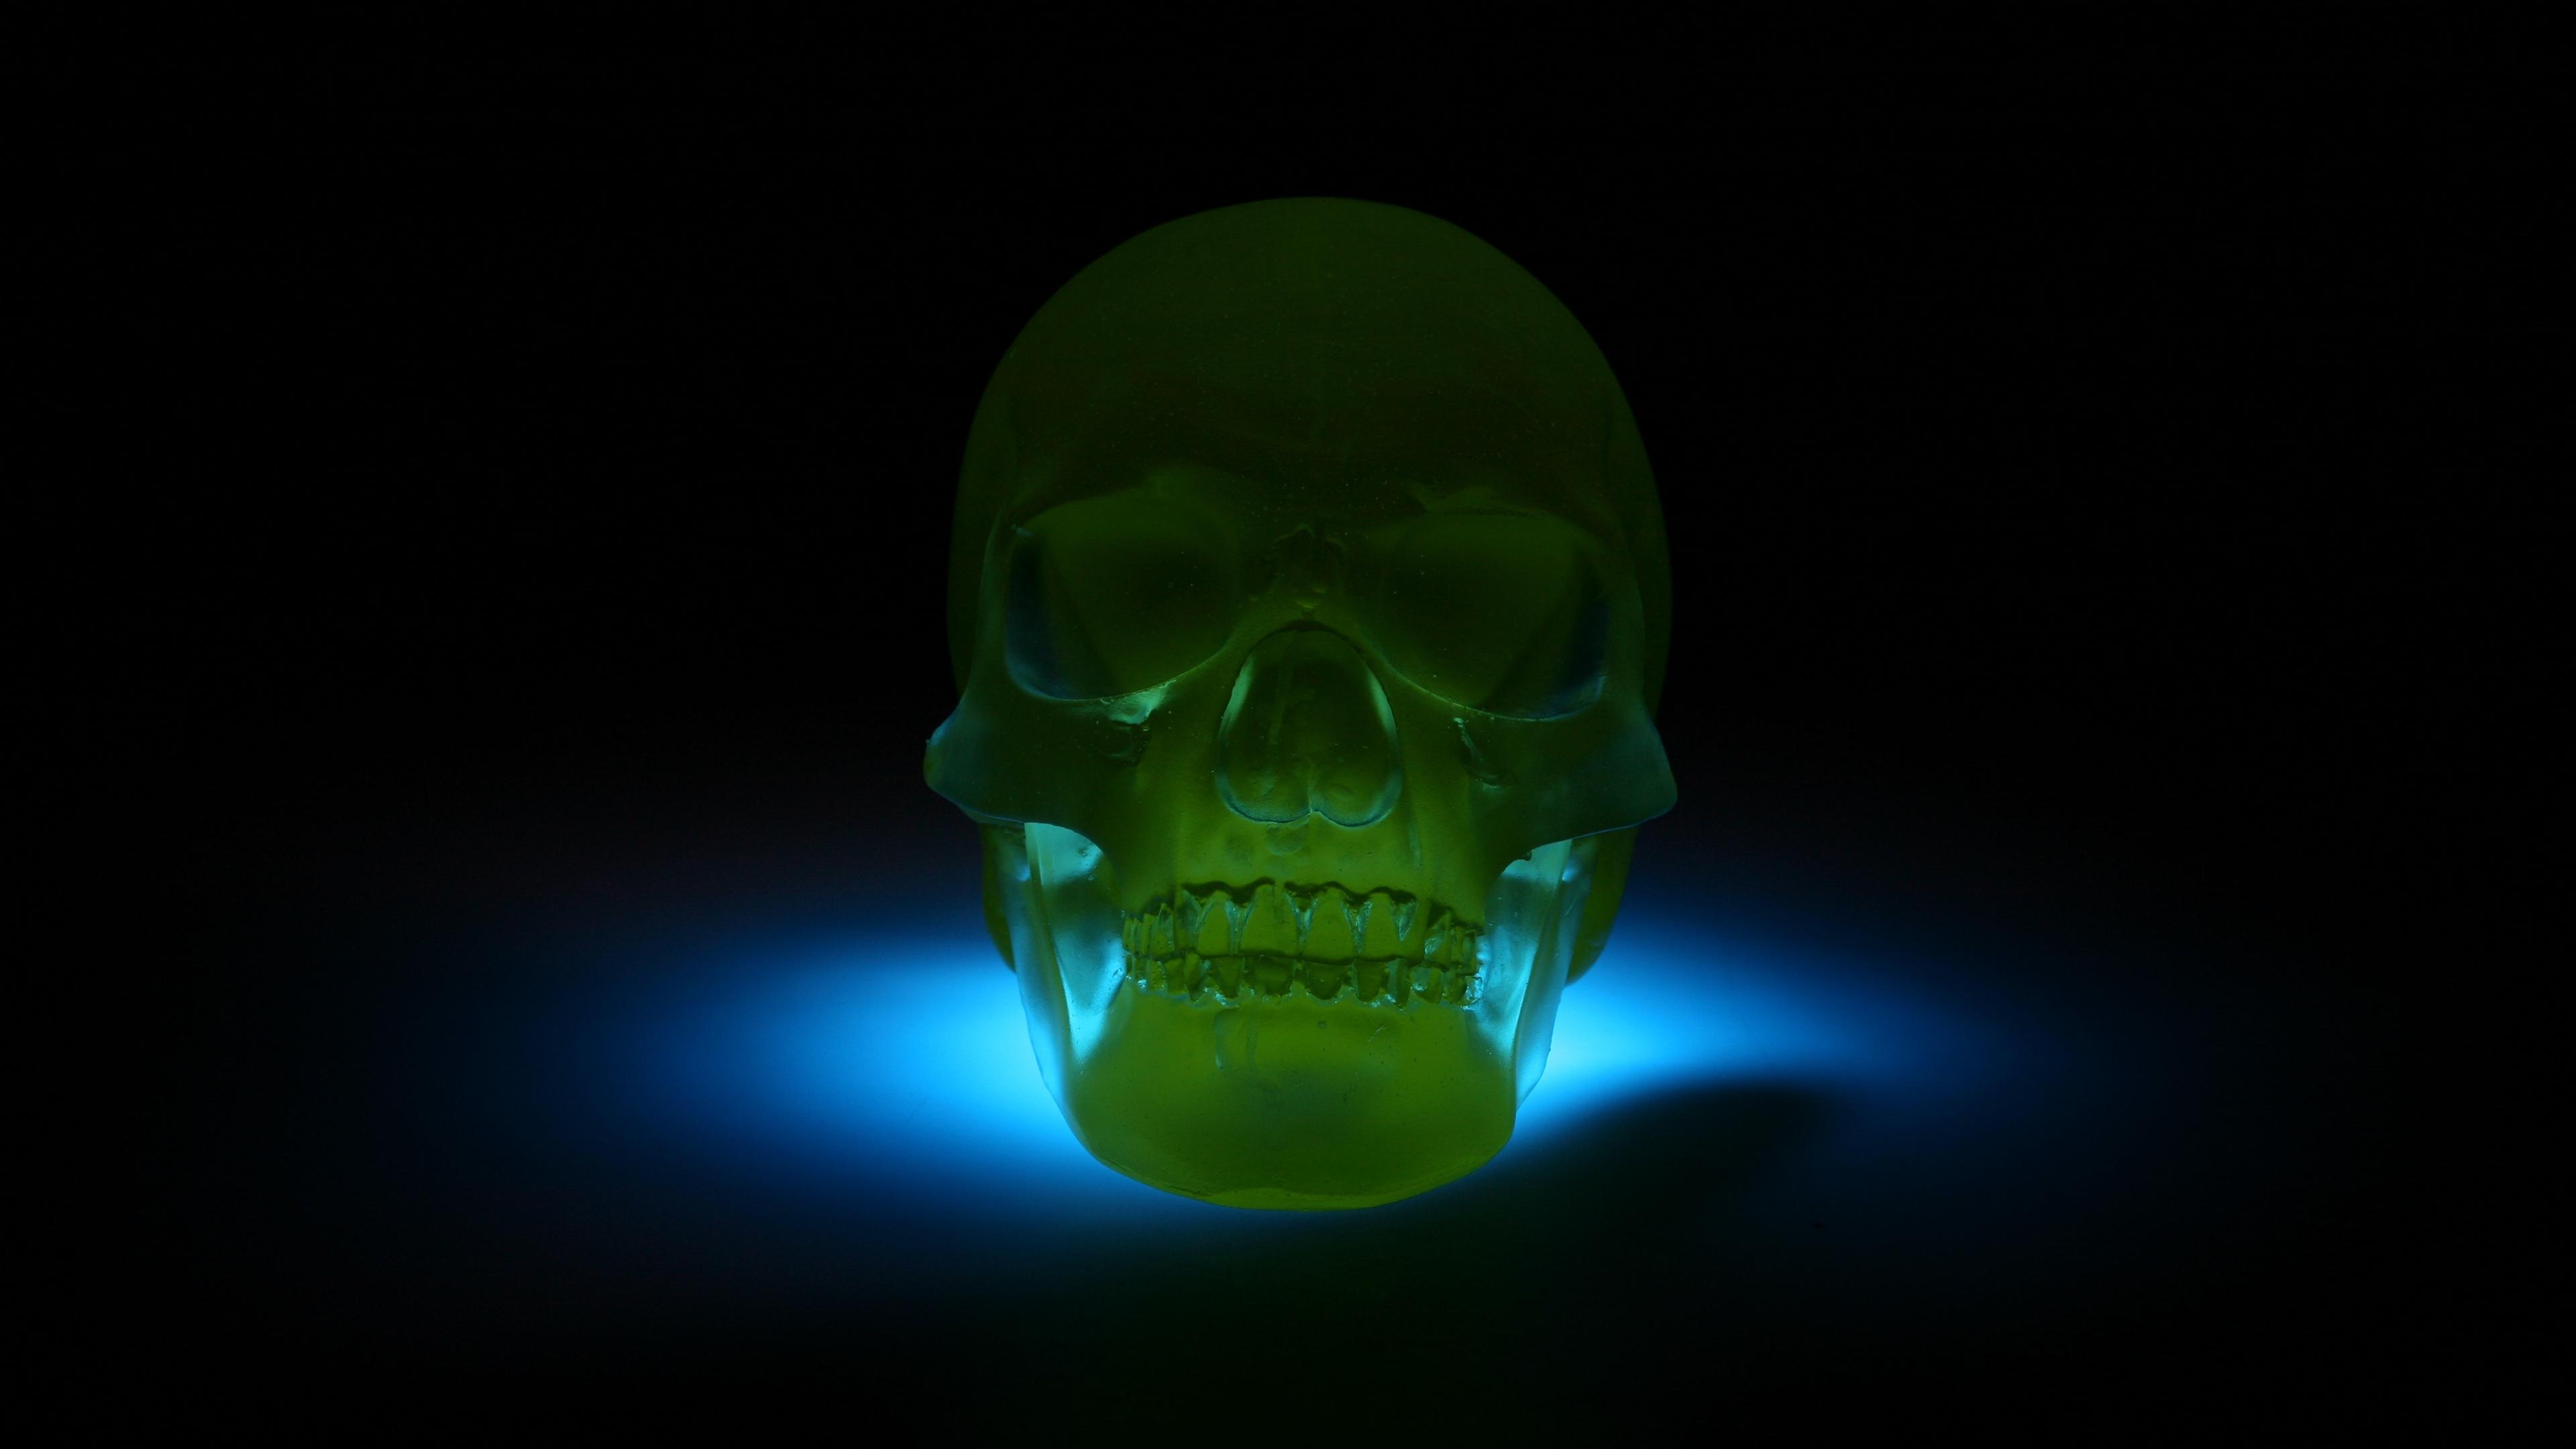 skull 3d model neon shadow 4k 1540574346 - skull, 3d model, neon, shadow 4k - Skull, Neon, 3d model